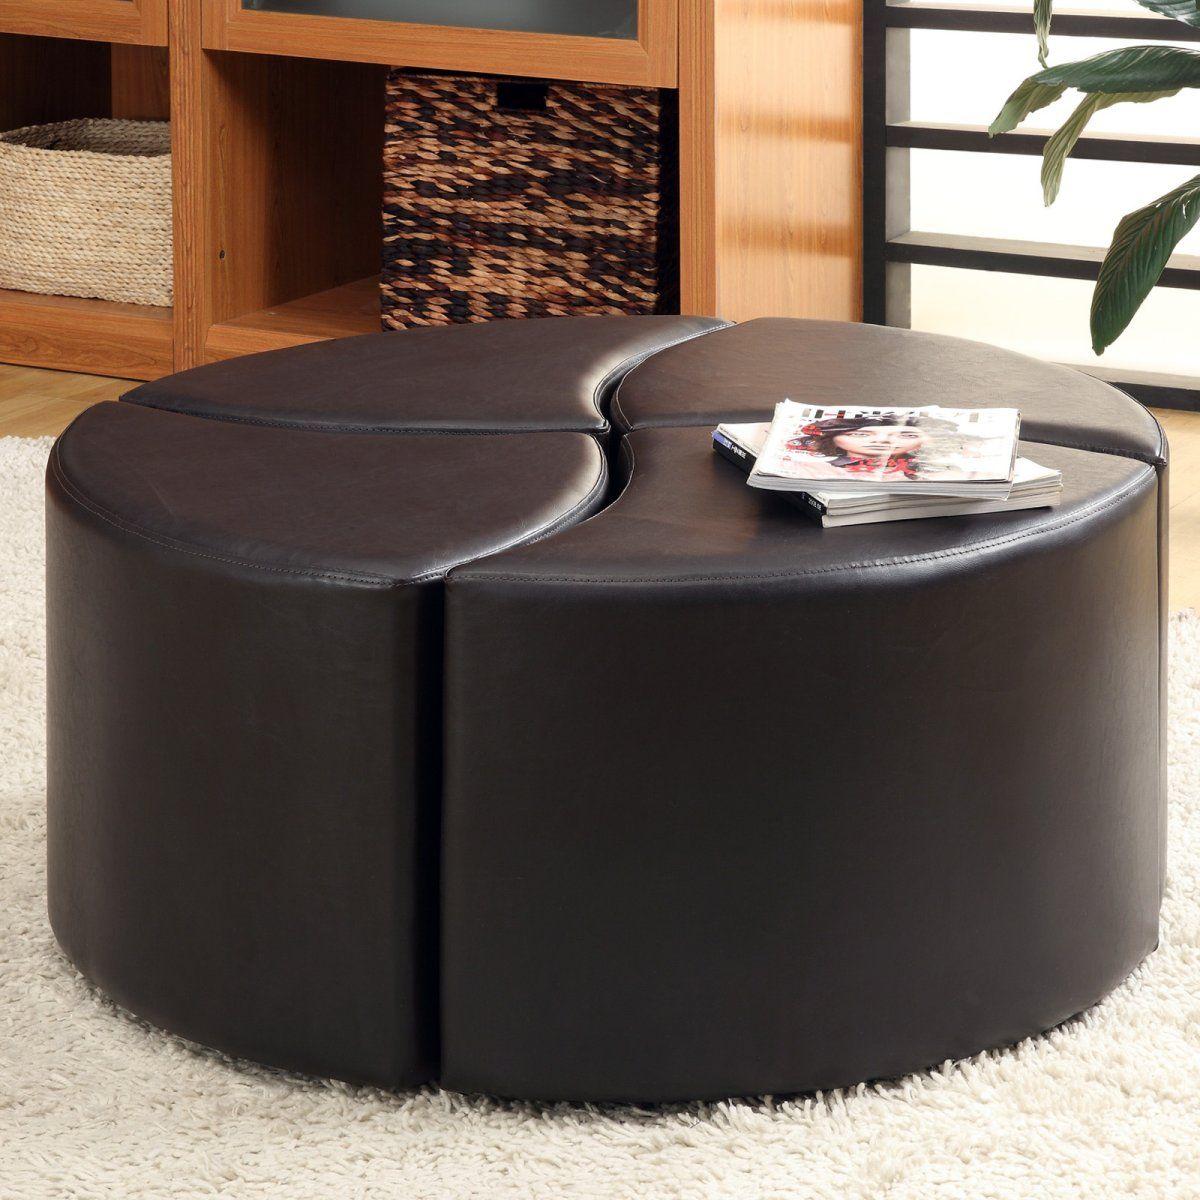 4 Piece Cocktail Ottoman Leather Ottoman Coffee Table Storage Ottoman Coffee Table Round Leather Ottoman [ jpg ]